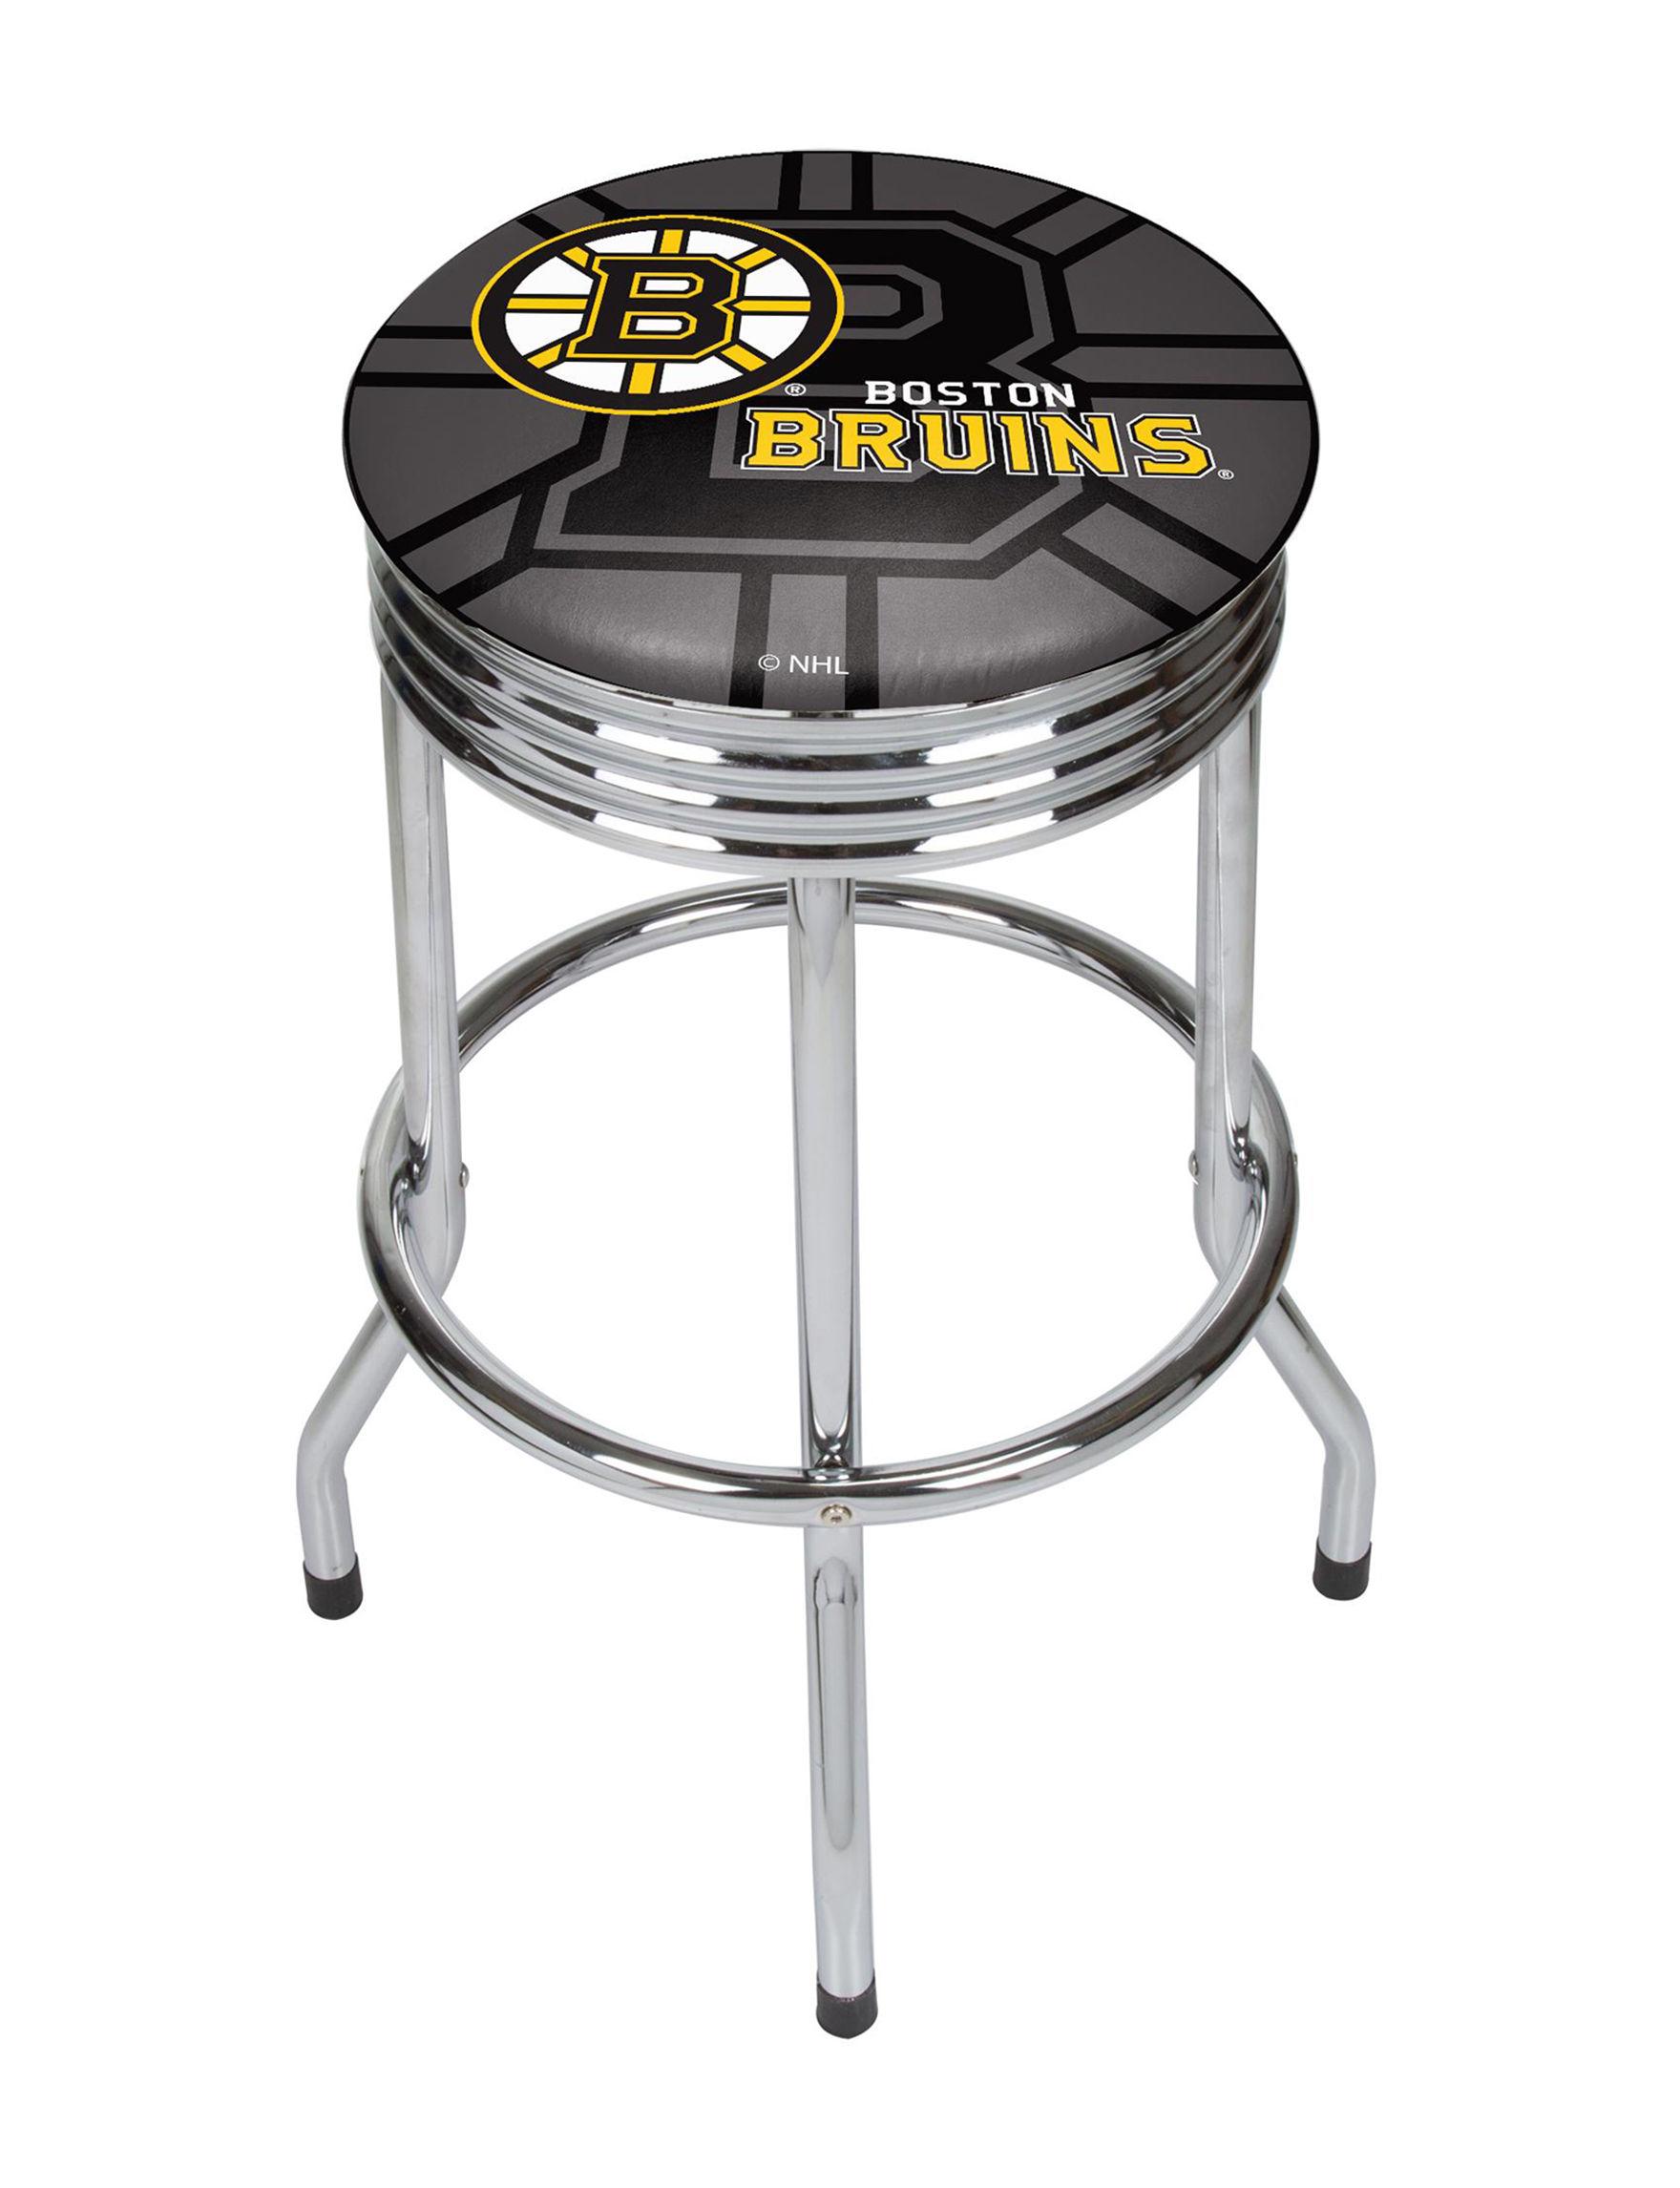 NHL Black / Yellow Bar & Kitchen Stools Kitchen & Dining Furniture